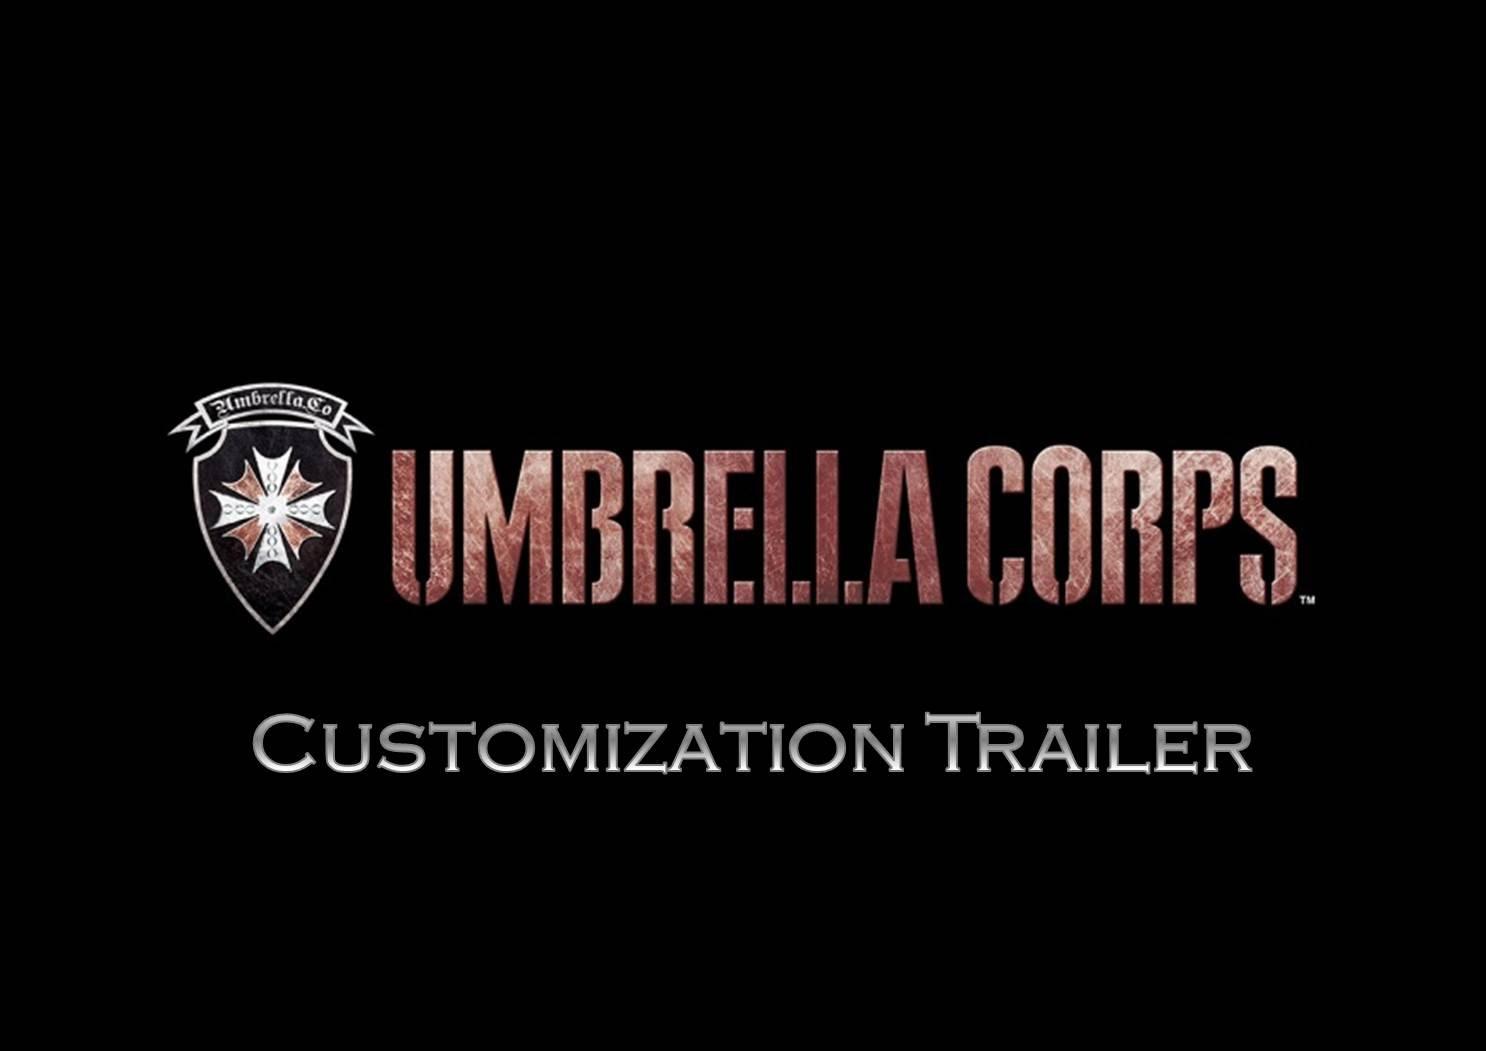 UMBRELLA CORPS - Customization Trailer